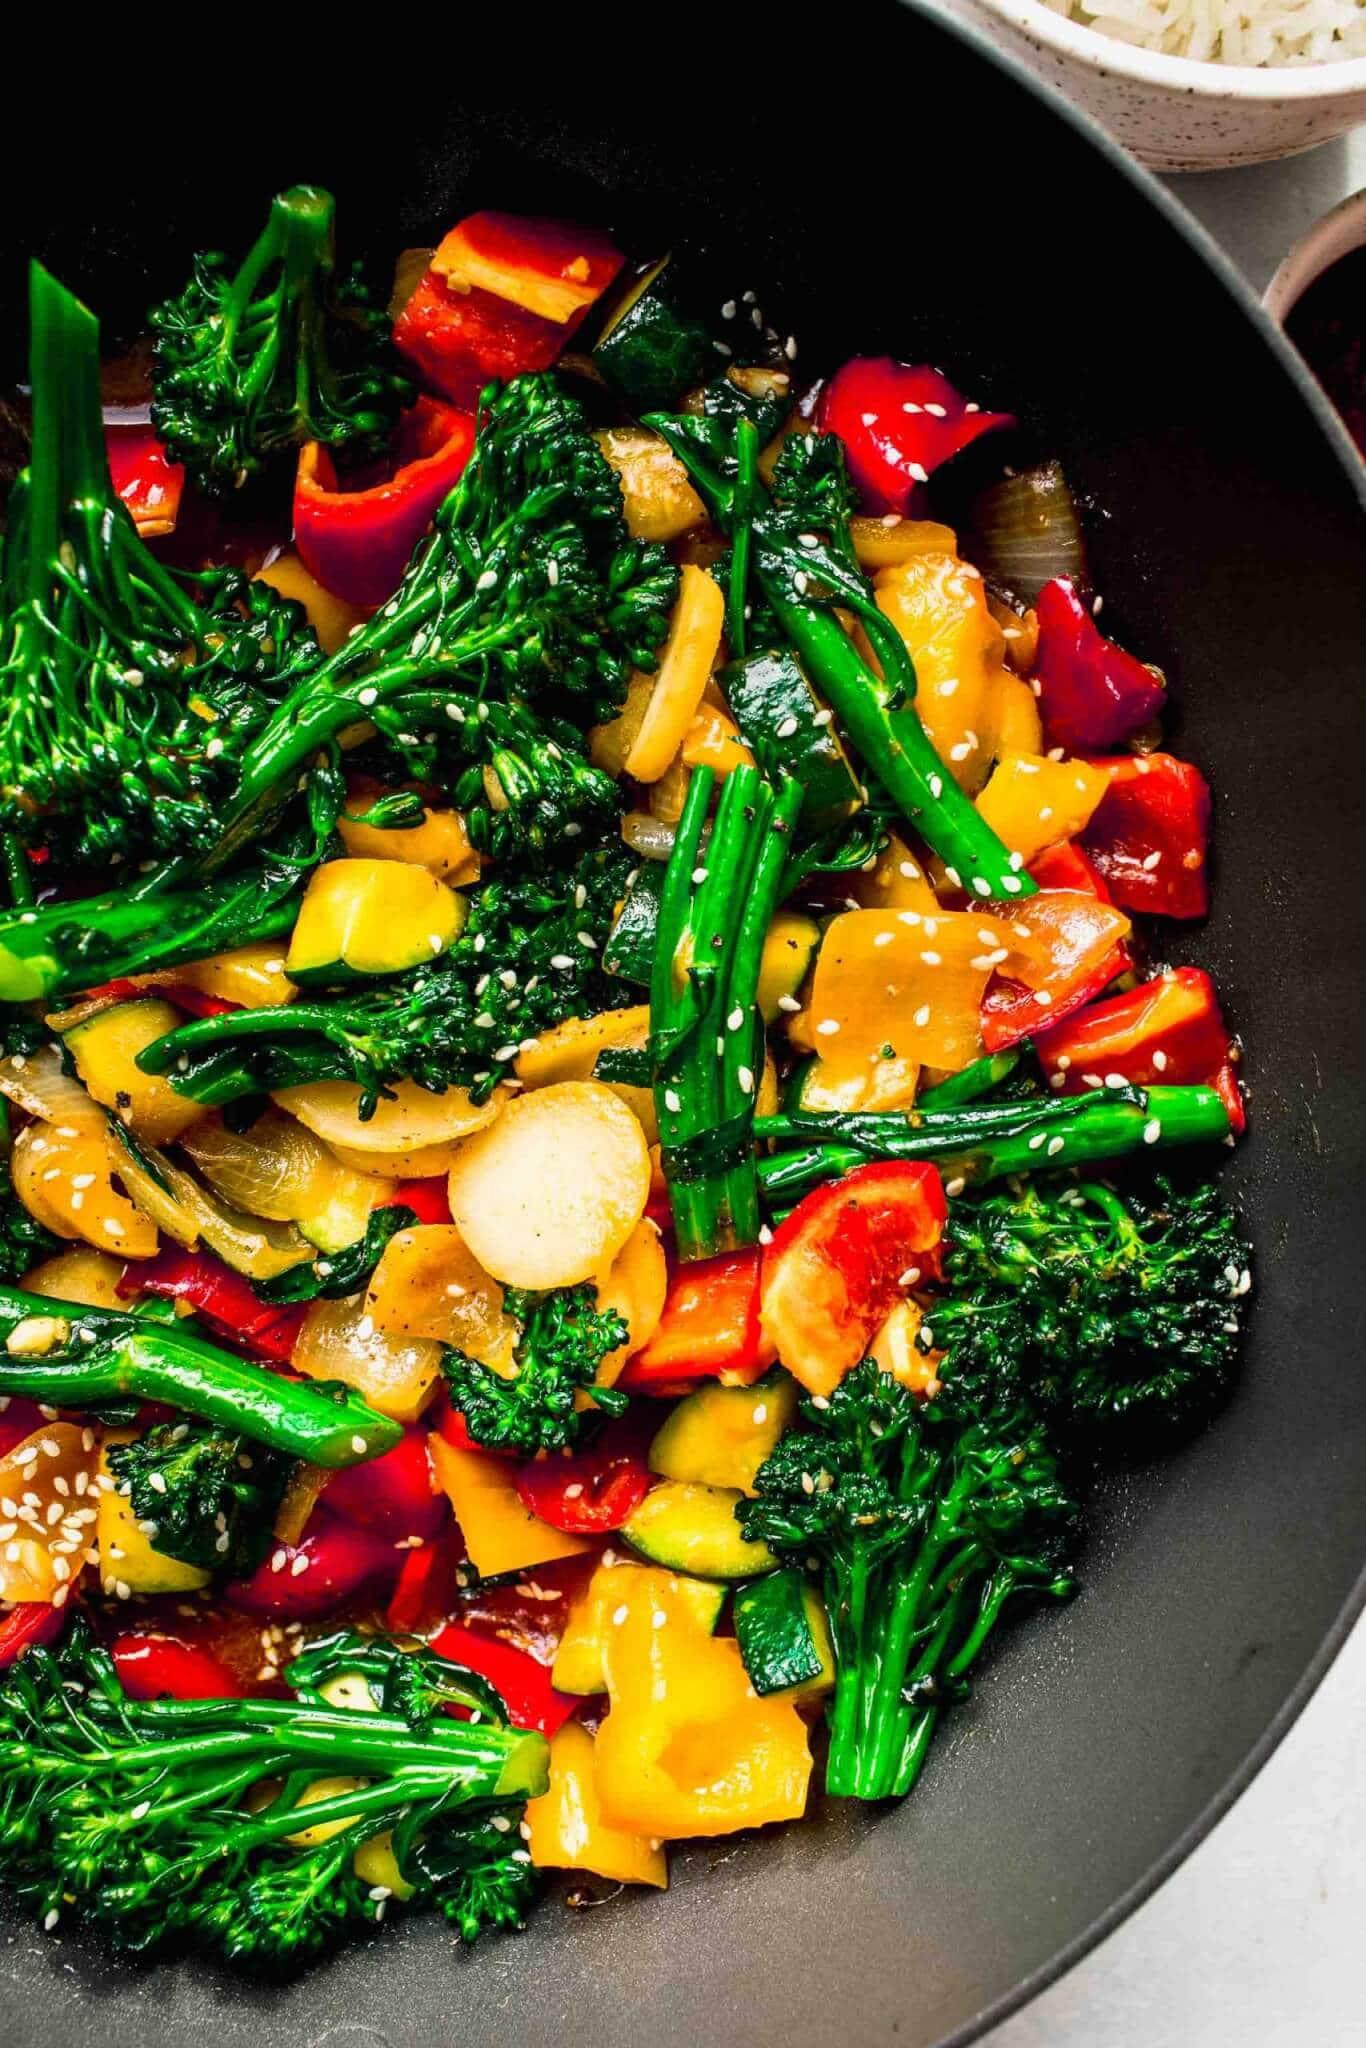 Close up of veggie stir fry in wok.